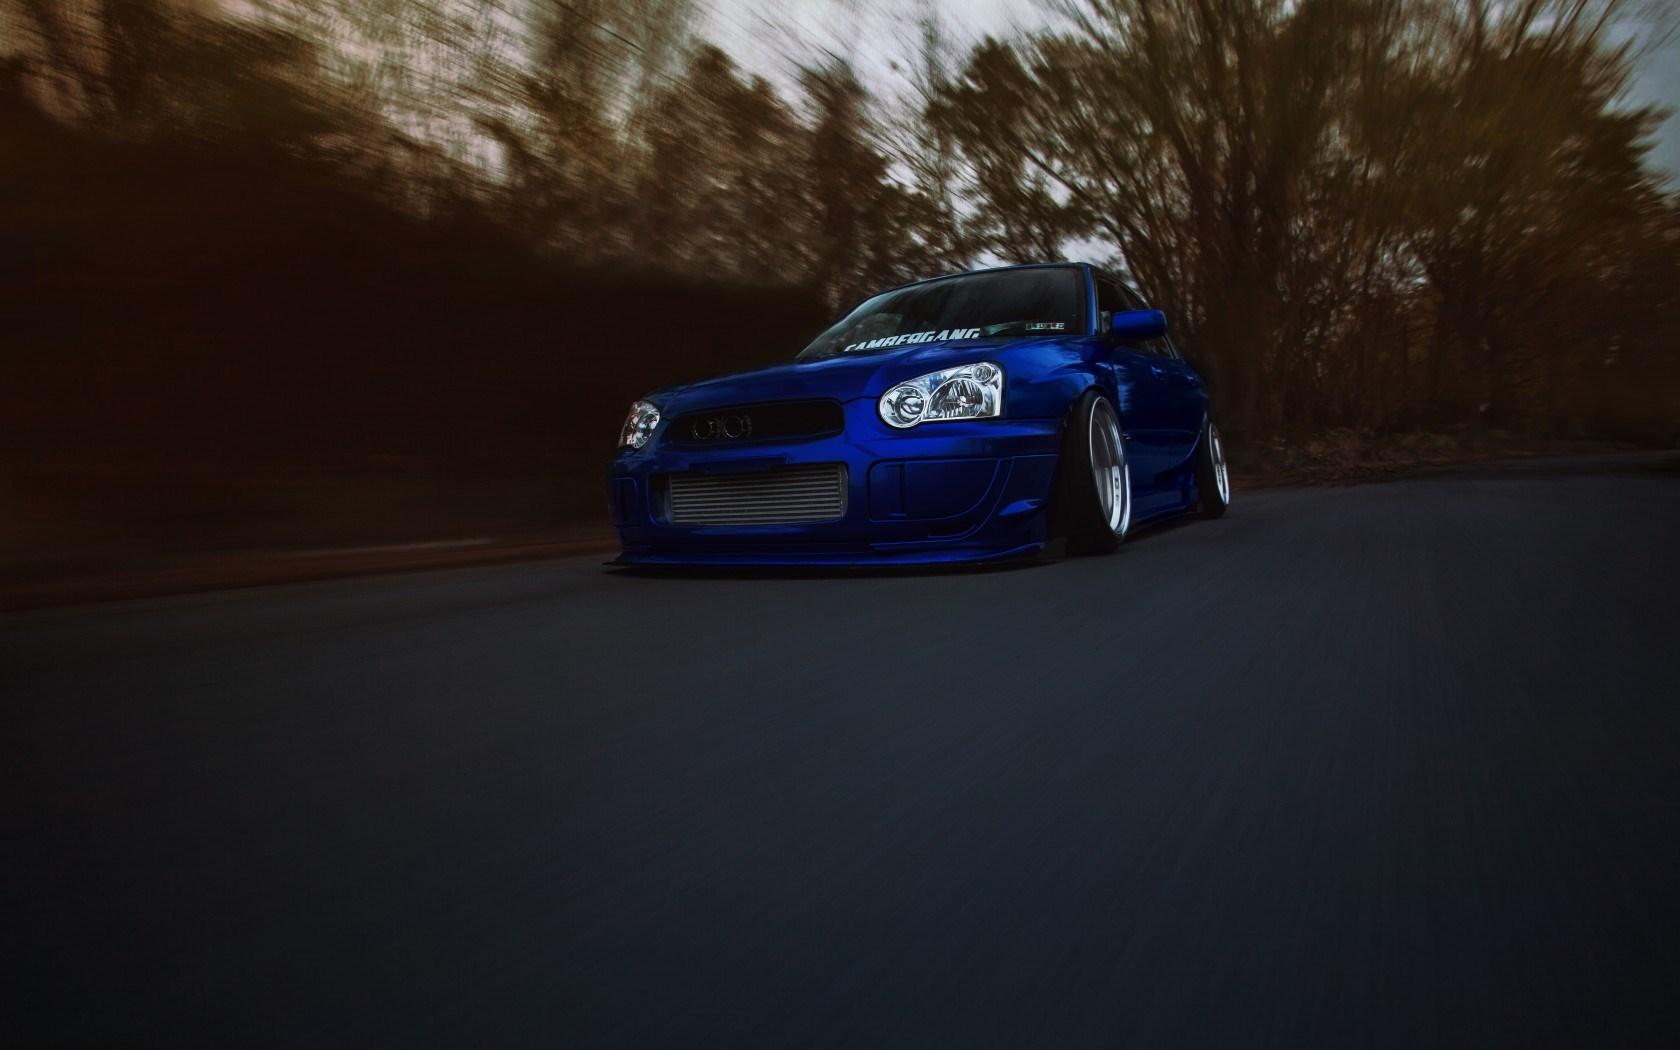 Subaru Impreza WRX STI Blue Car Road Speed